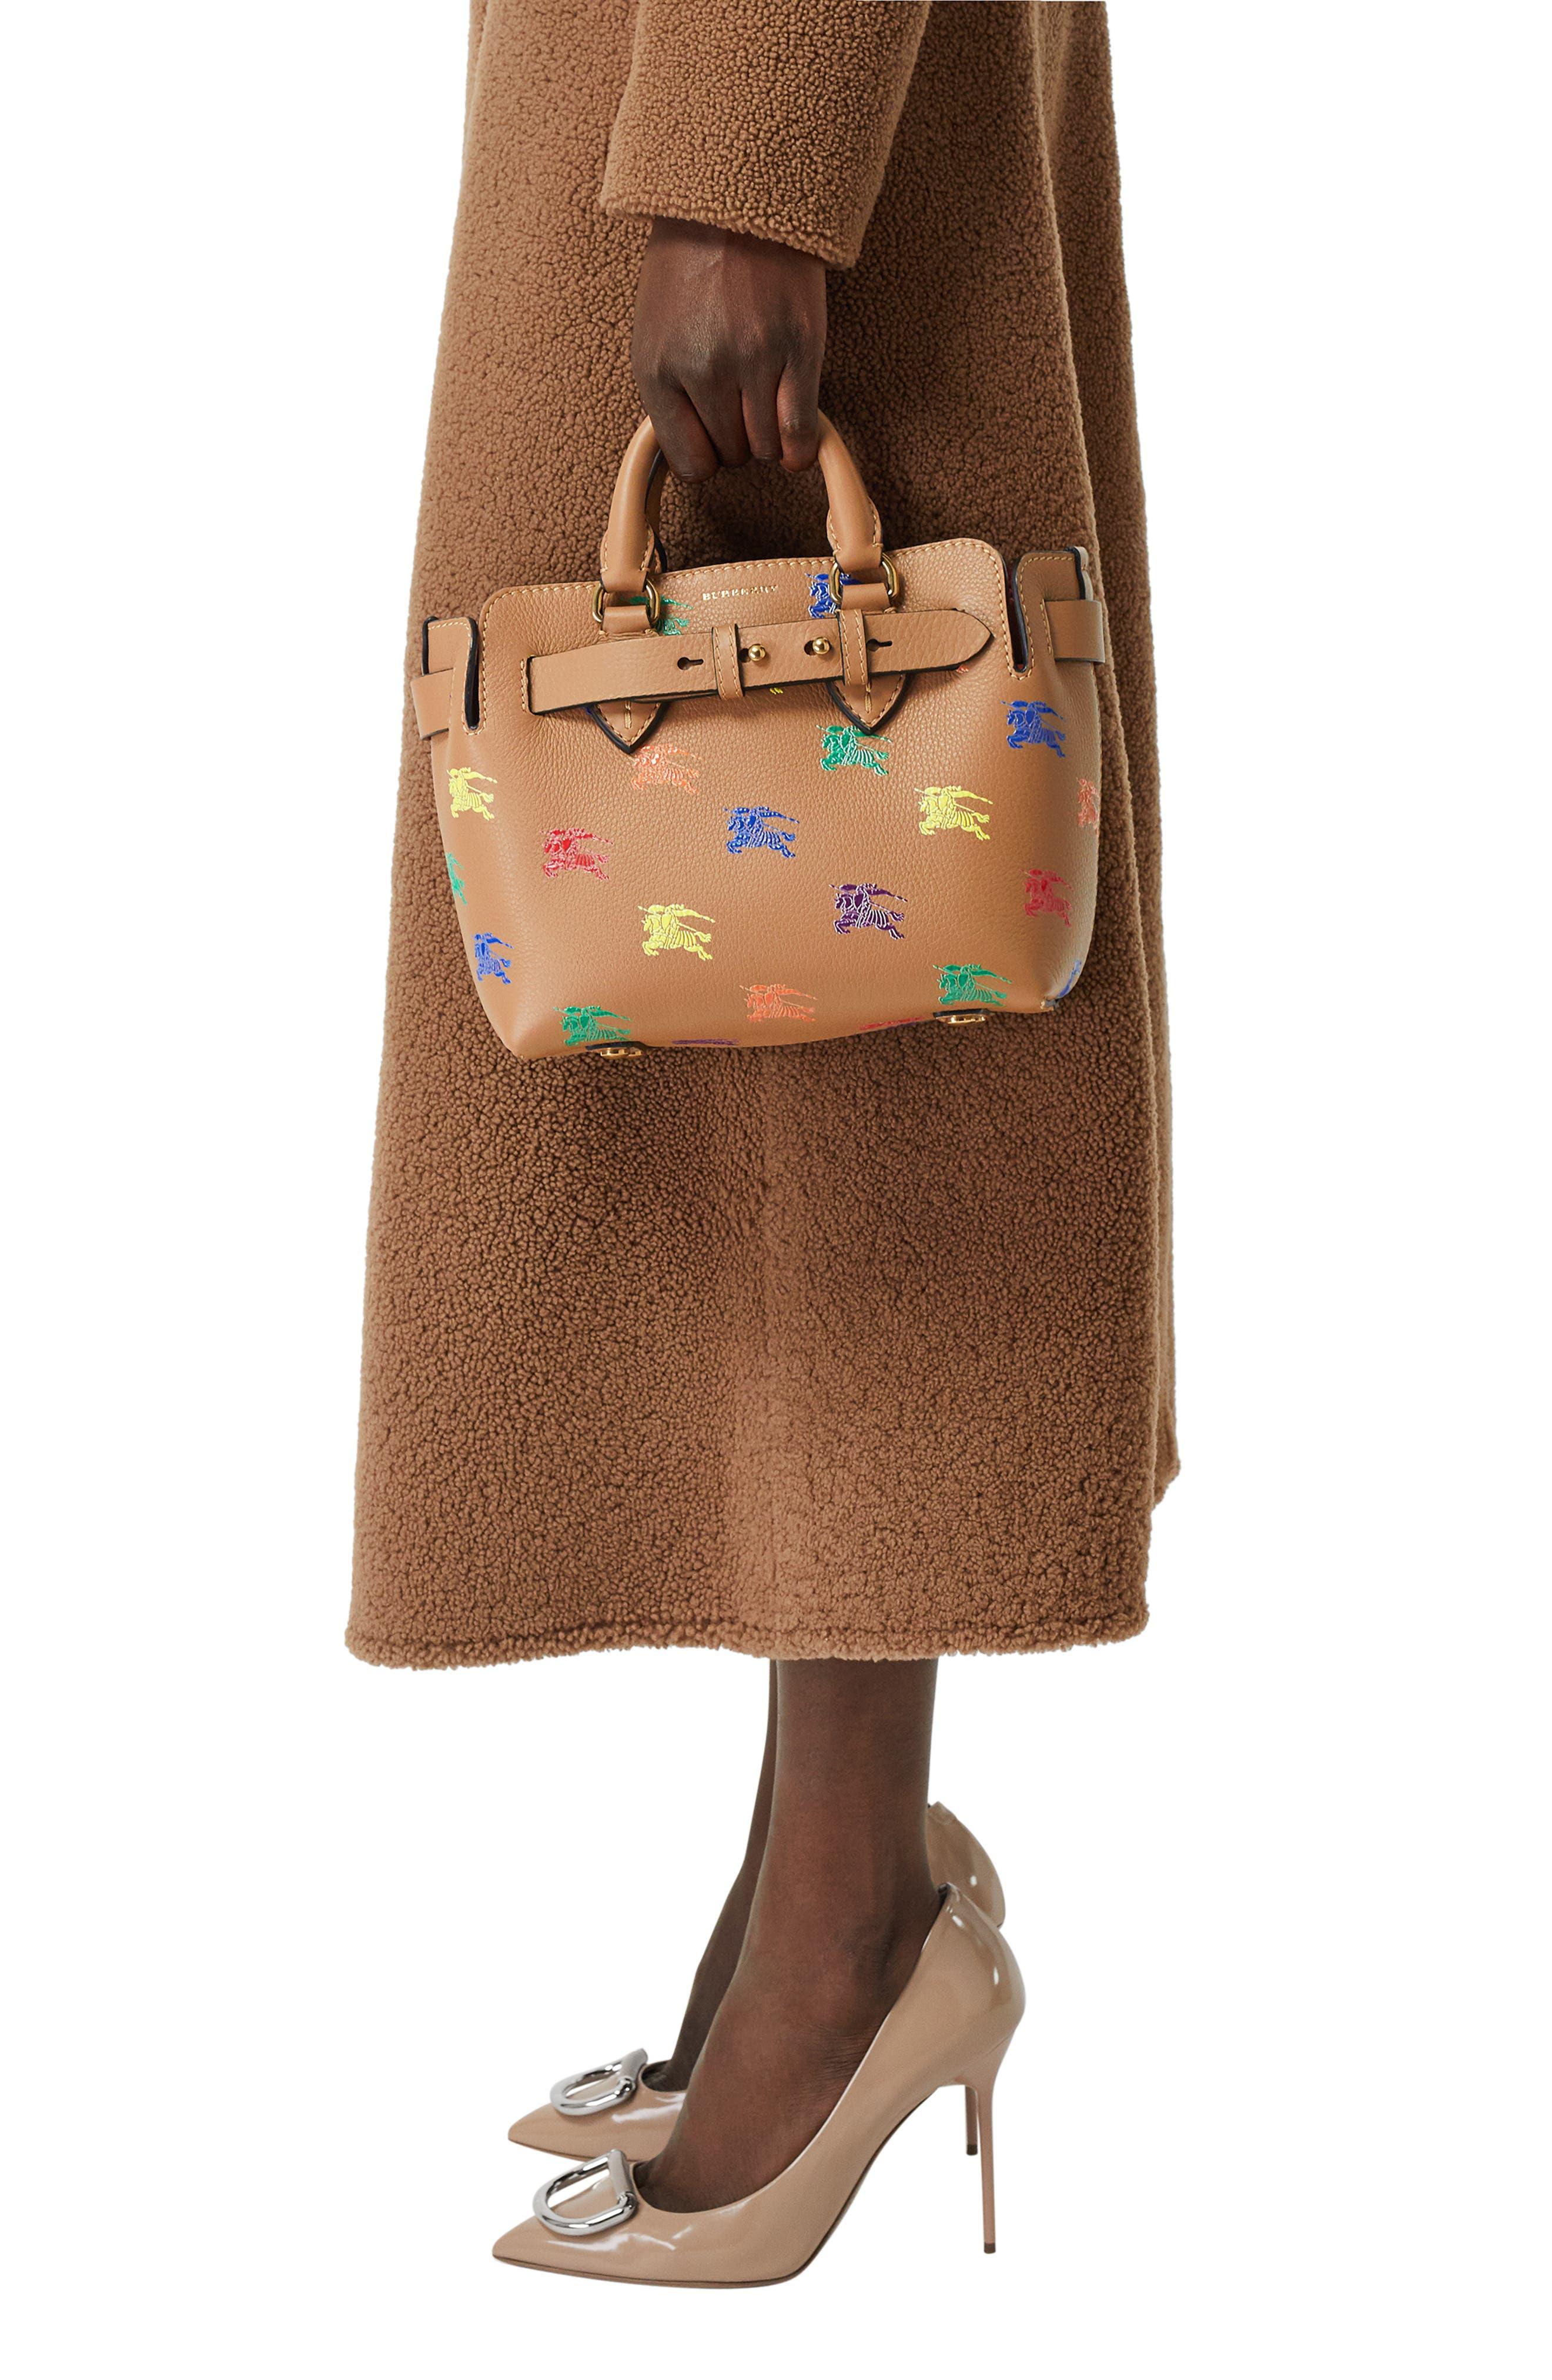 Baby Belt Bag Rainbow Logo Leather Tote,                             Alternate thumbnail 8, color,                             LIGHT CAMEL